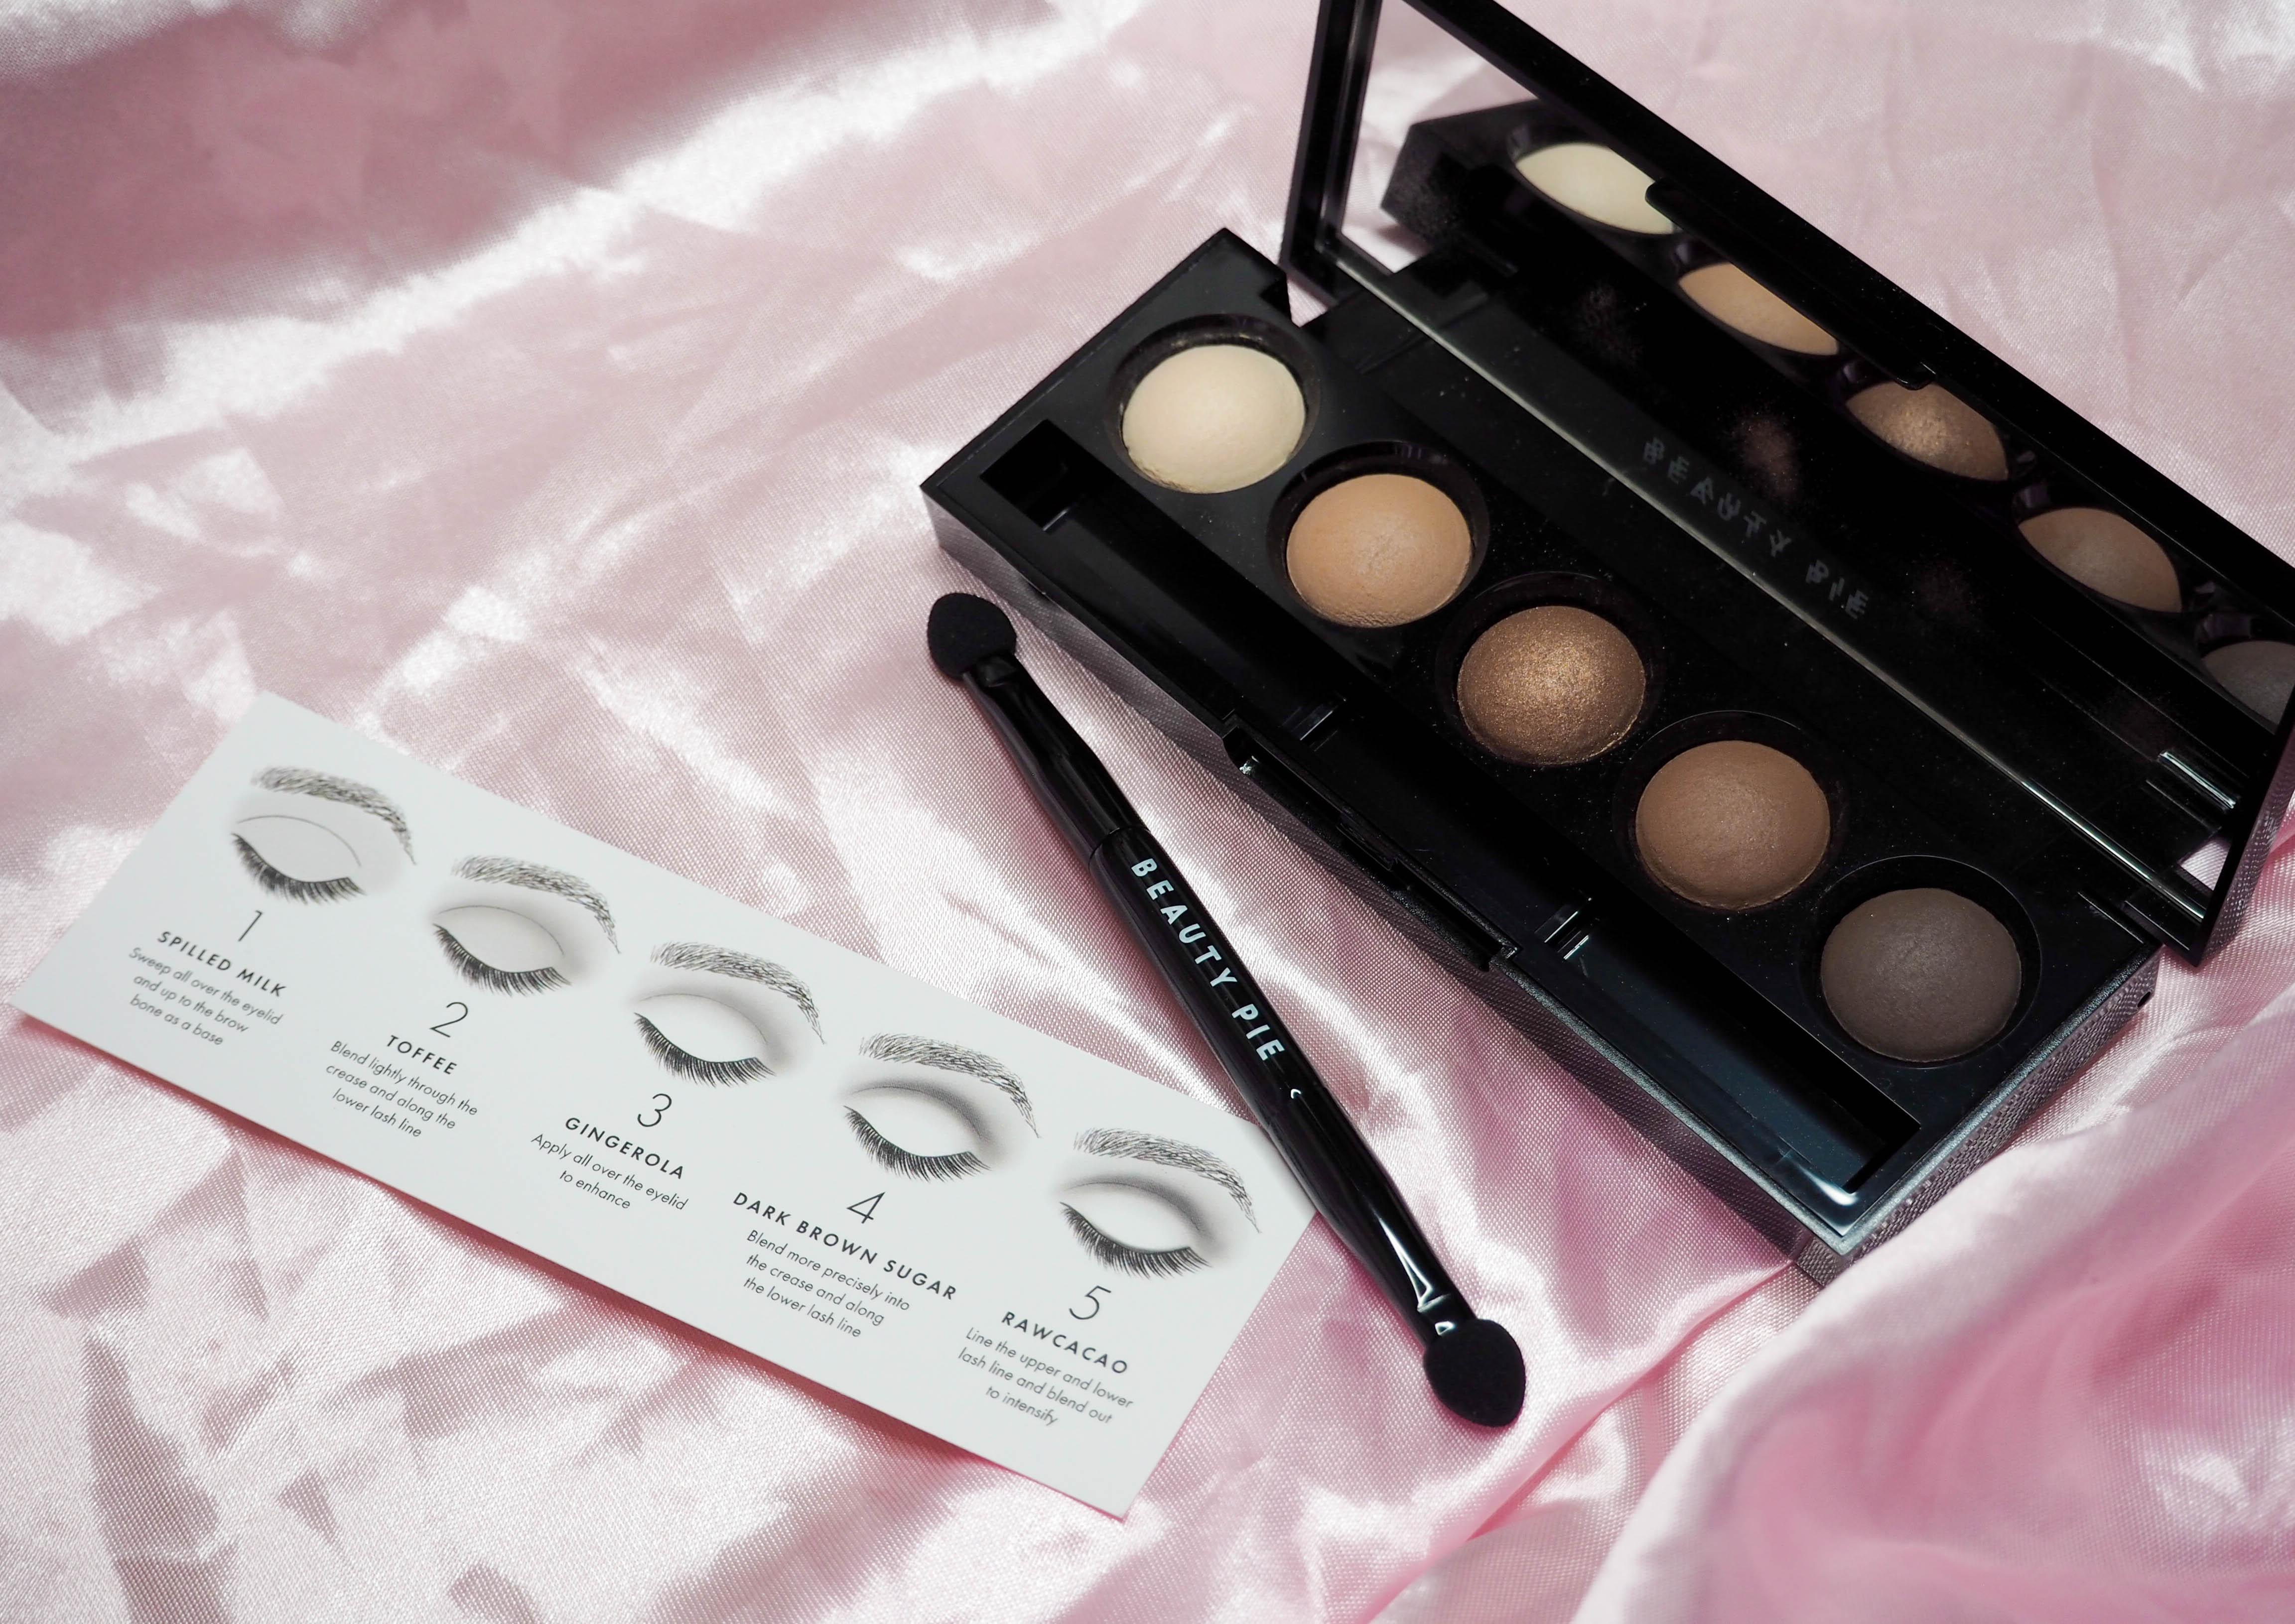 Beauty Pie Perfect Pocket Palette Eyeshadow